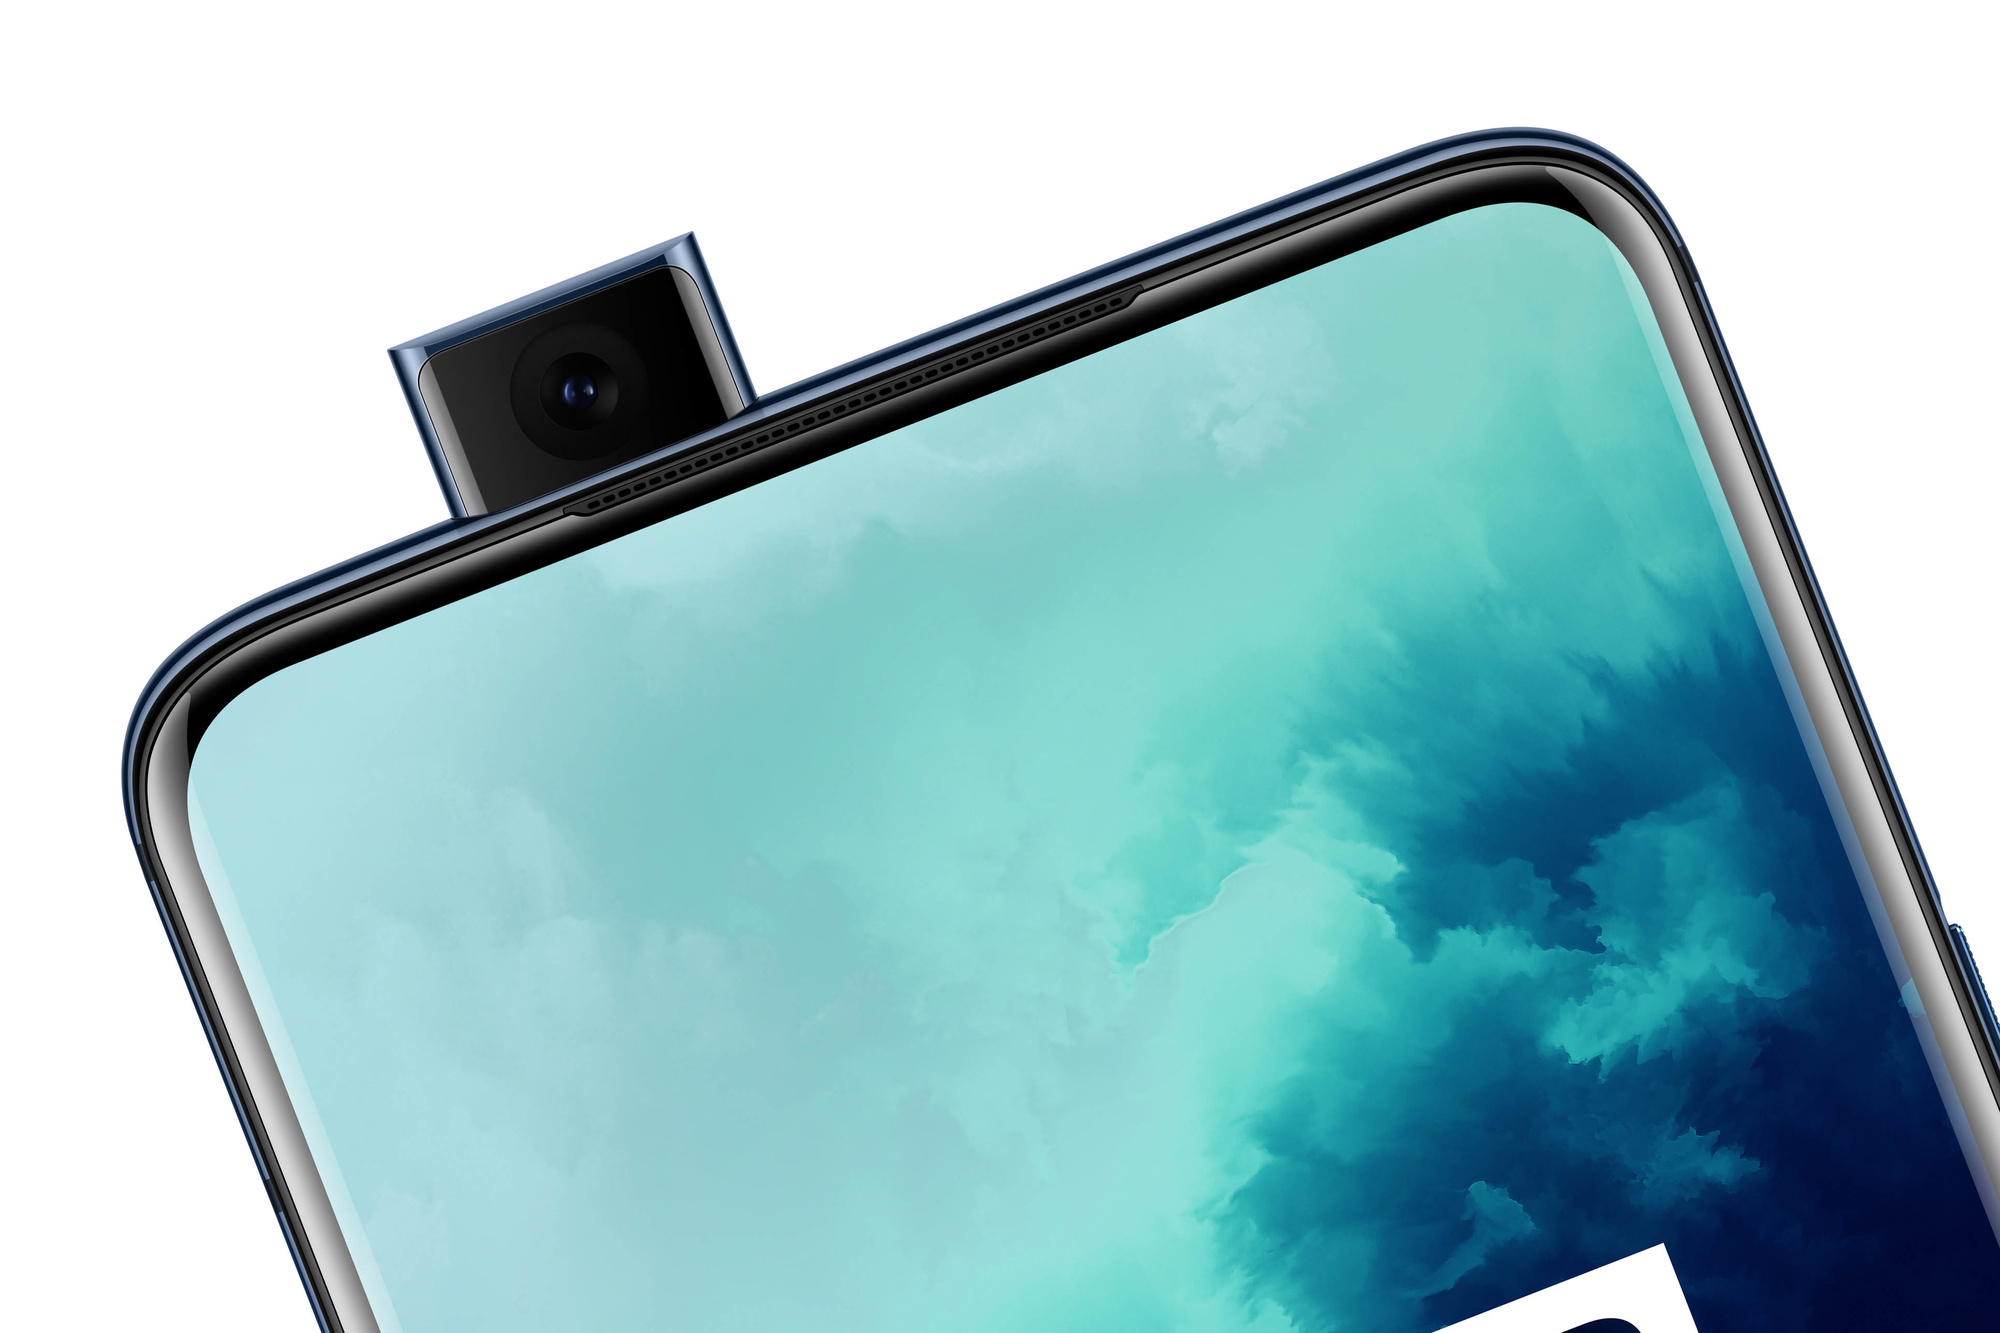 OnePlus 7 Pro, OnePlus